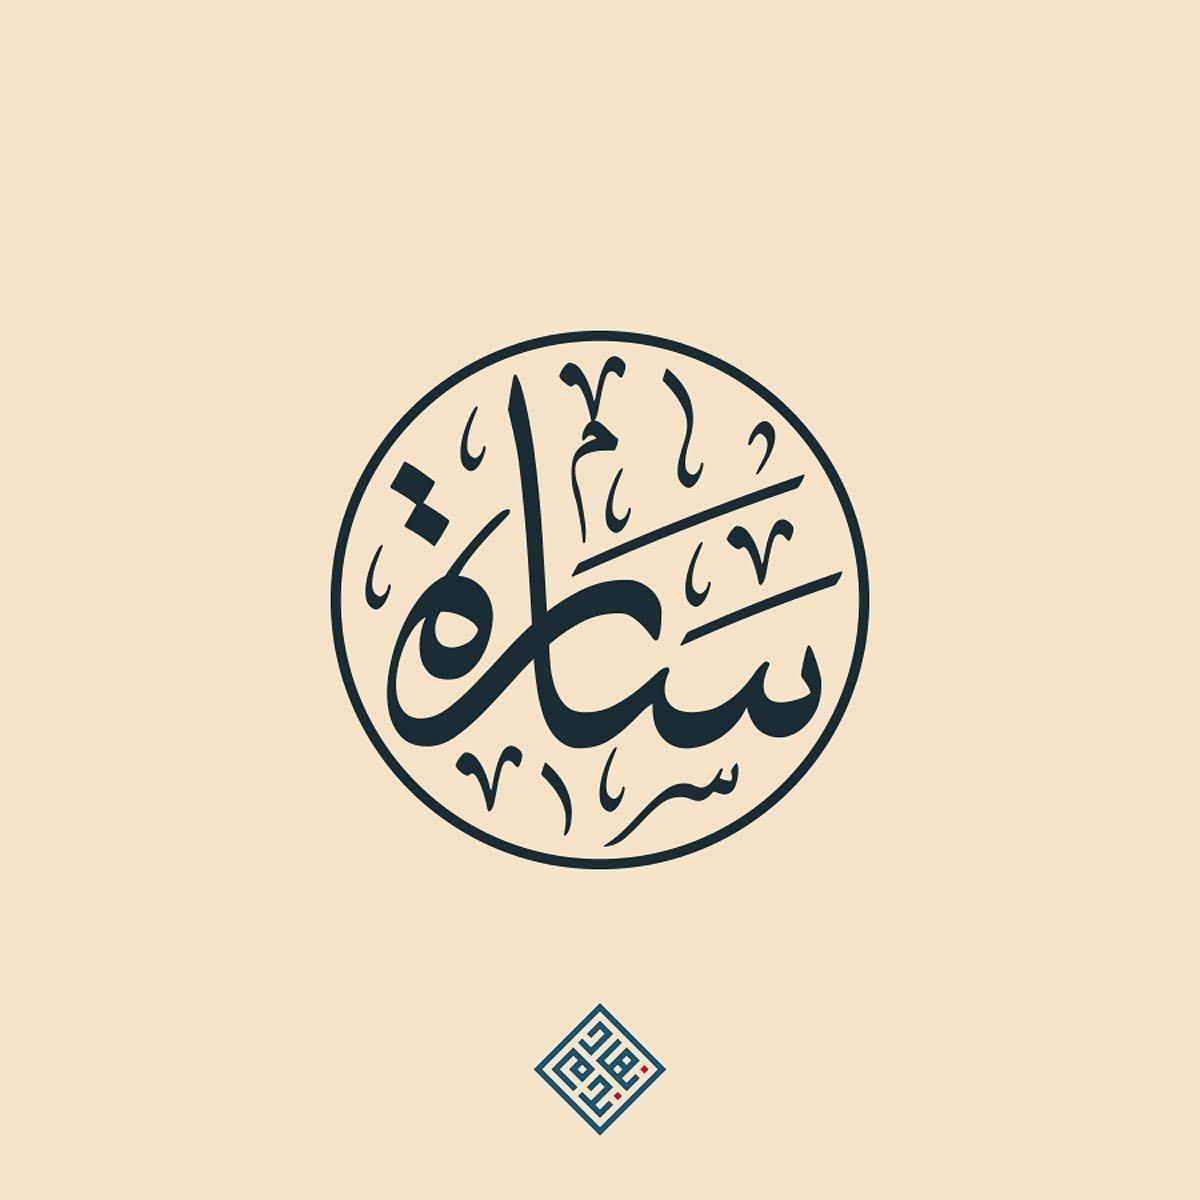 لوغو اسم سارة Sara Logodesign Logo Design Instagram Typography